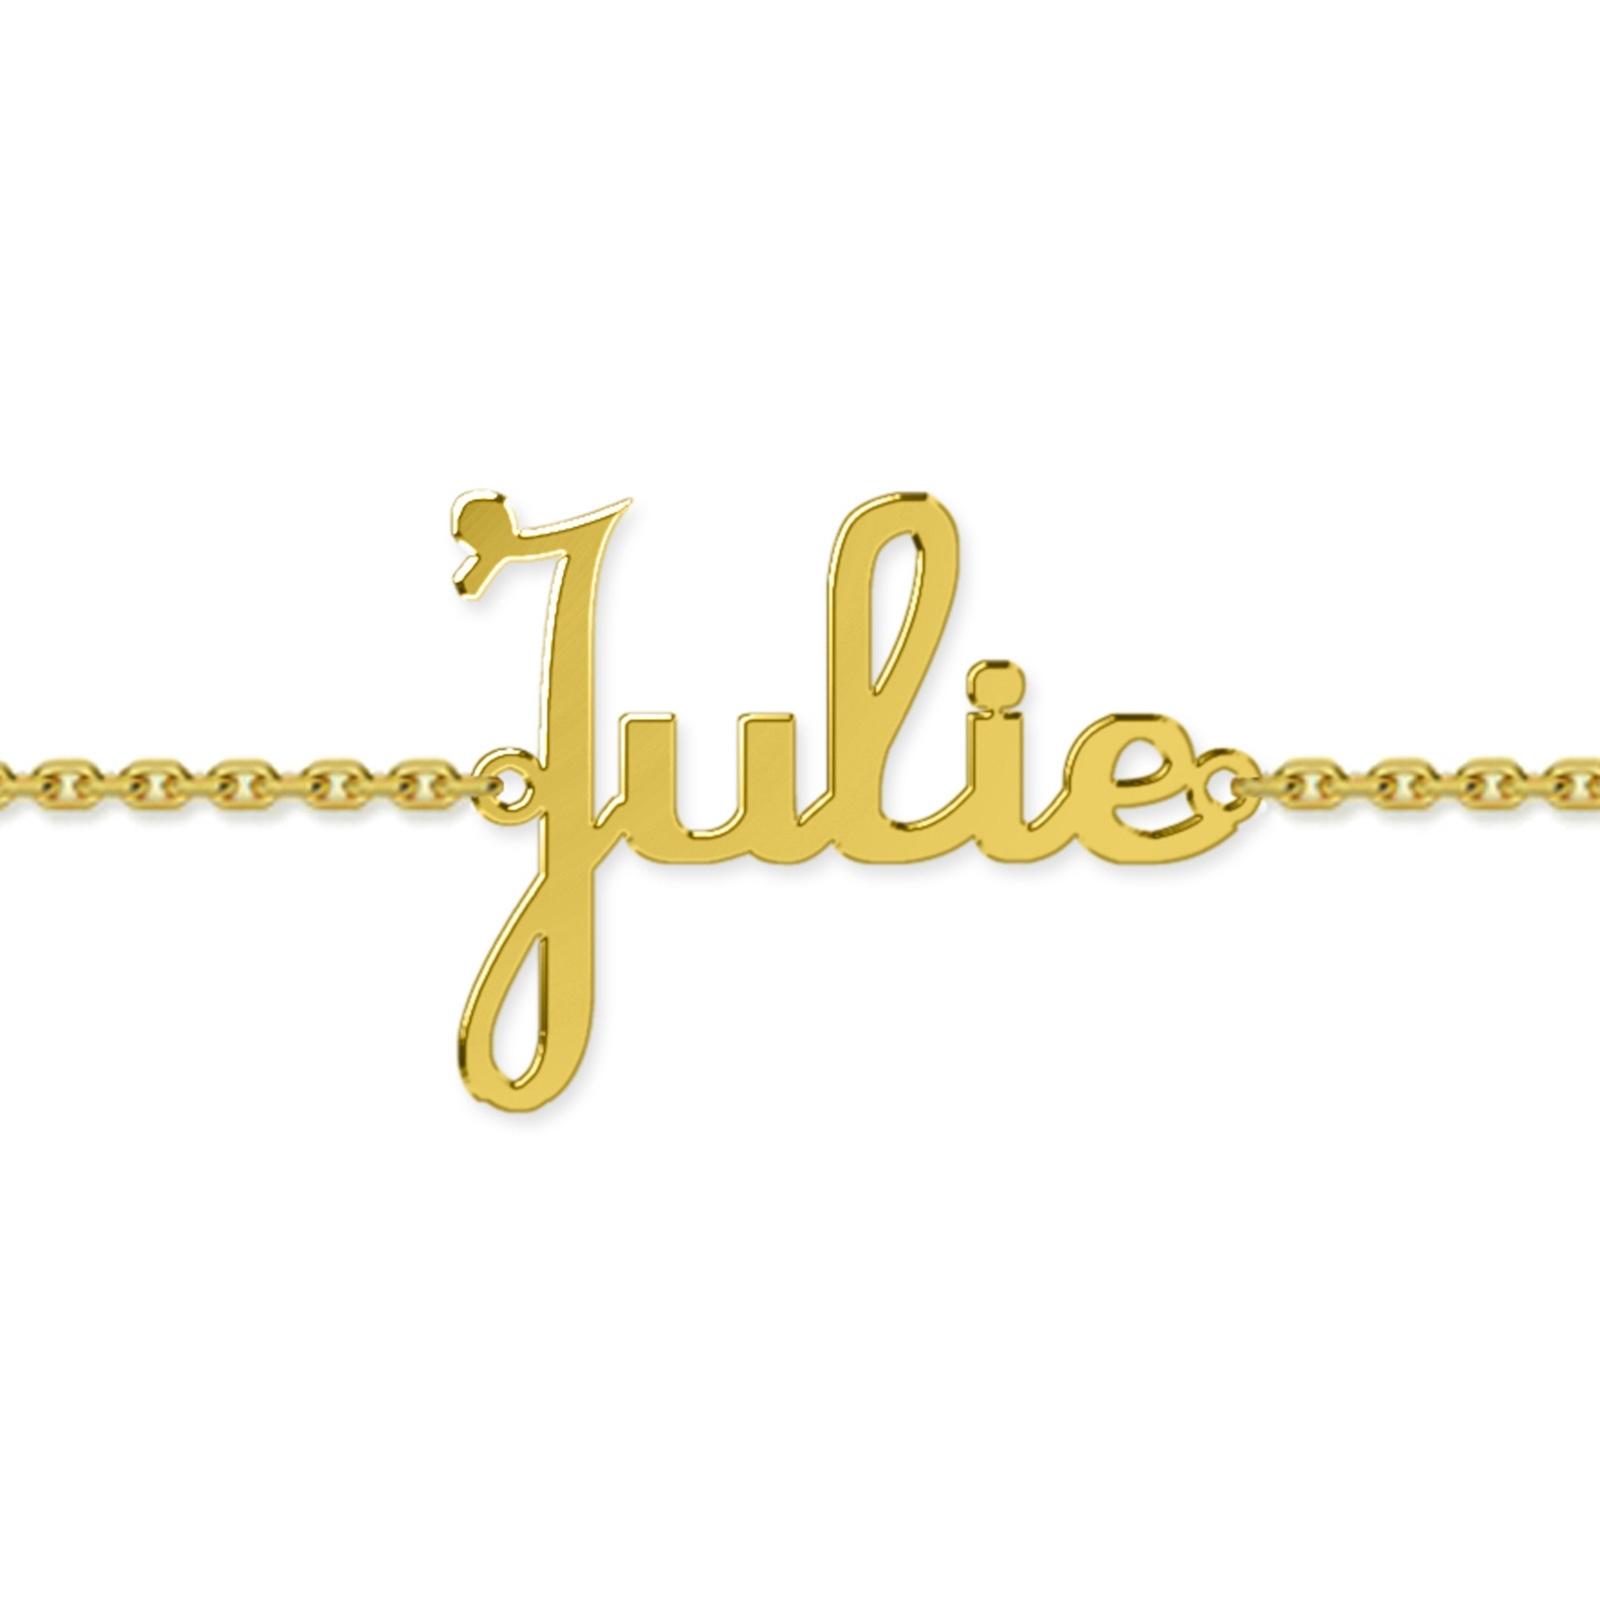 Bracelet bébé prénom découpé police script (or jaune 750°)